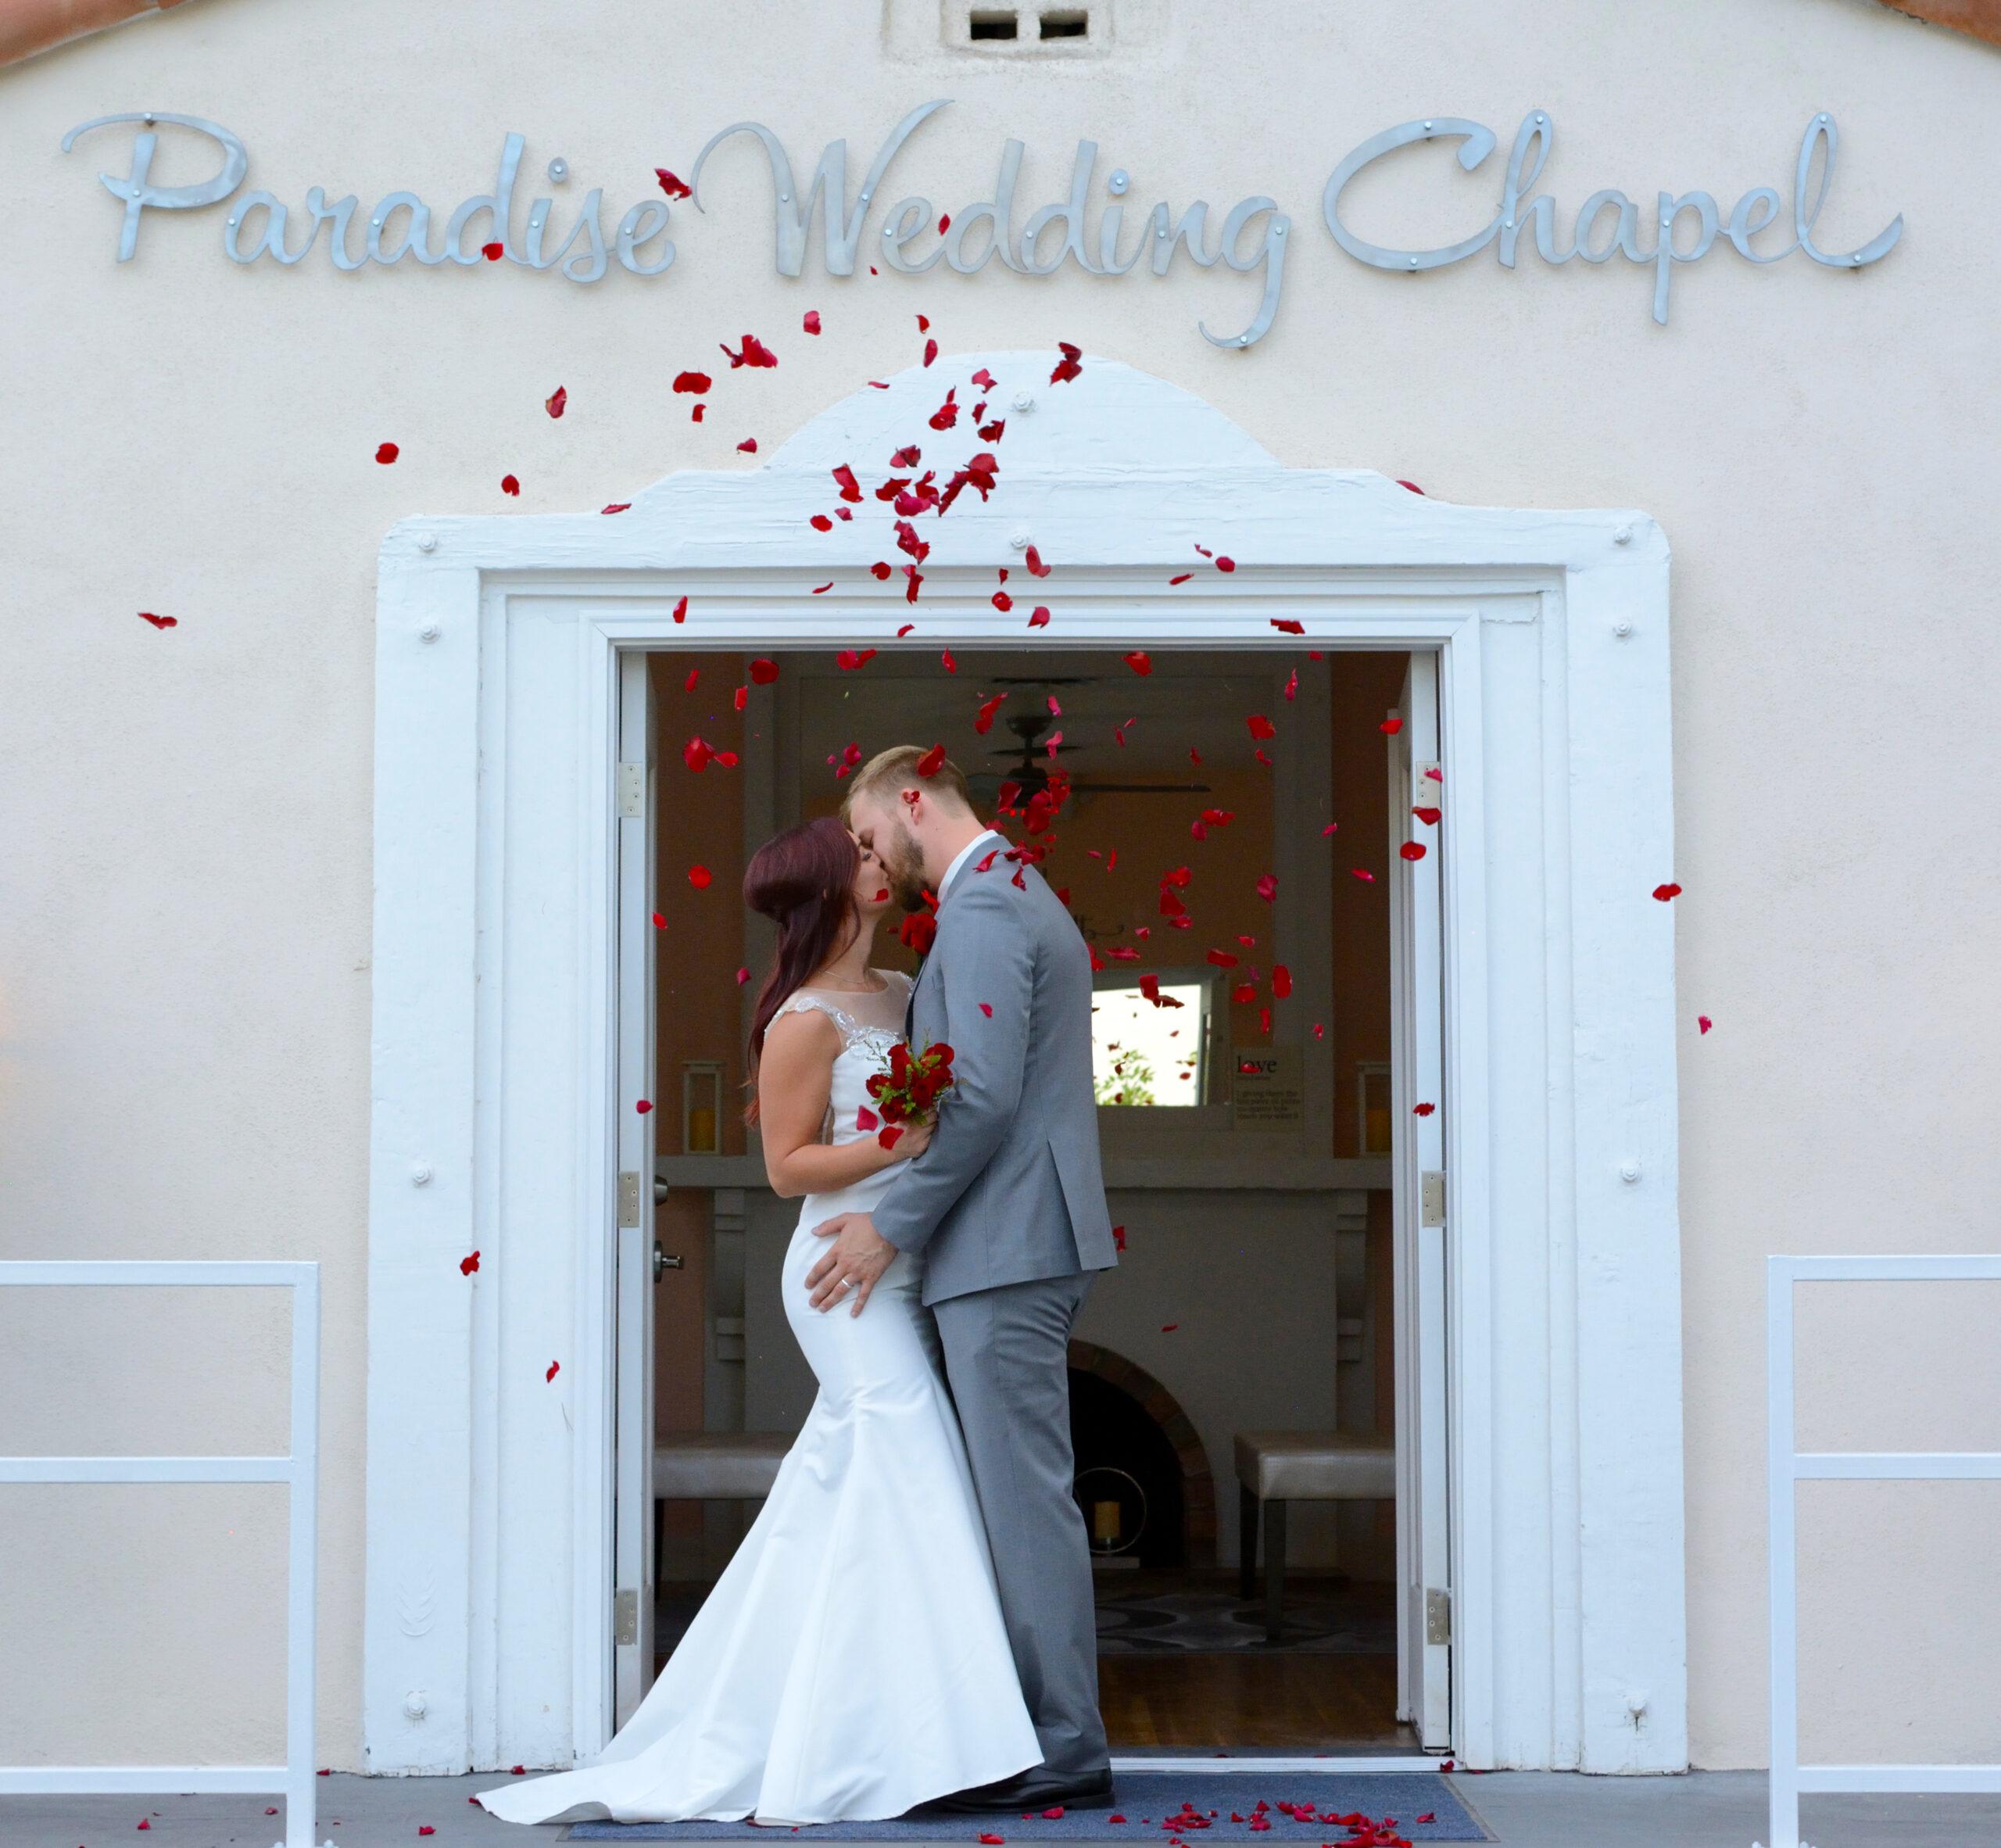 Las Vegas Paradise Wedding Chapel